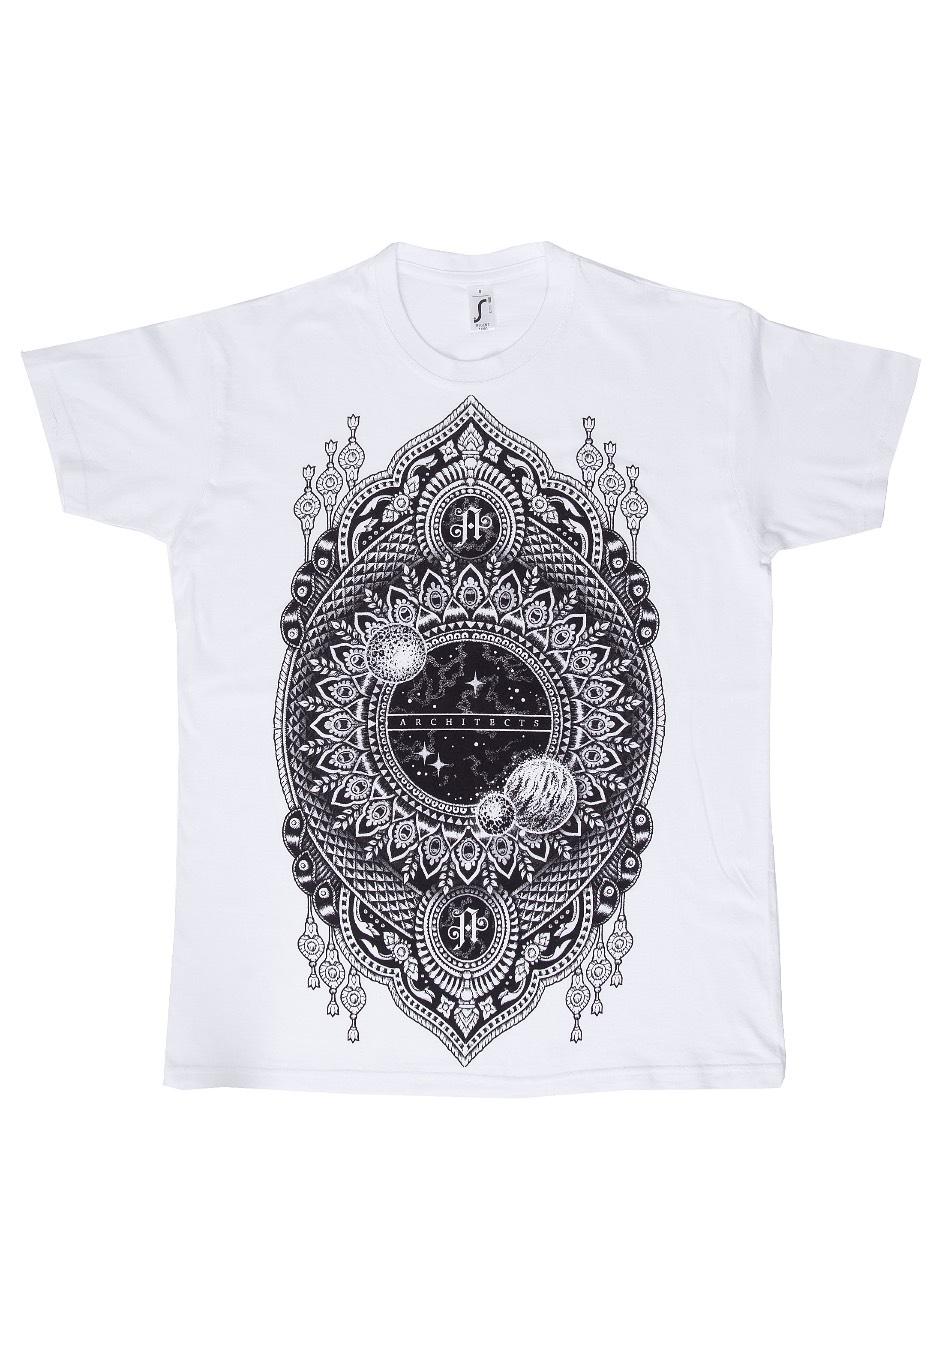 372cc254 Architects - Mandala Space White - T-Shirt - Official Mathcore Merchandise  Shop - Impericon.com US